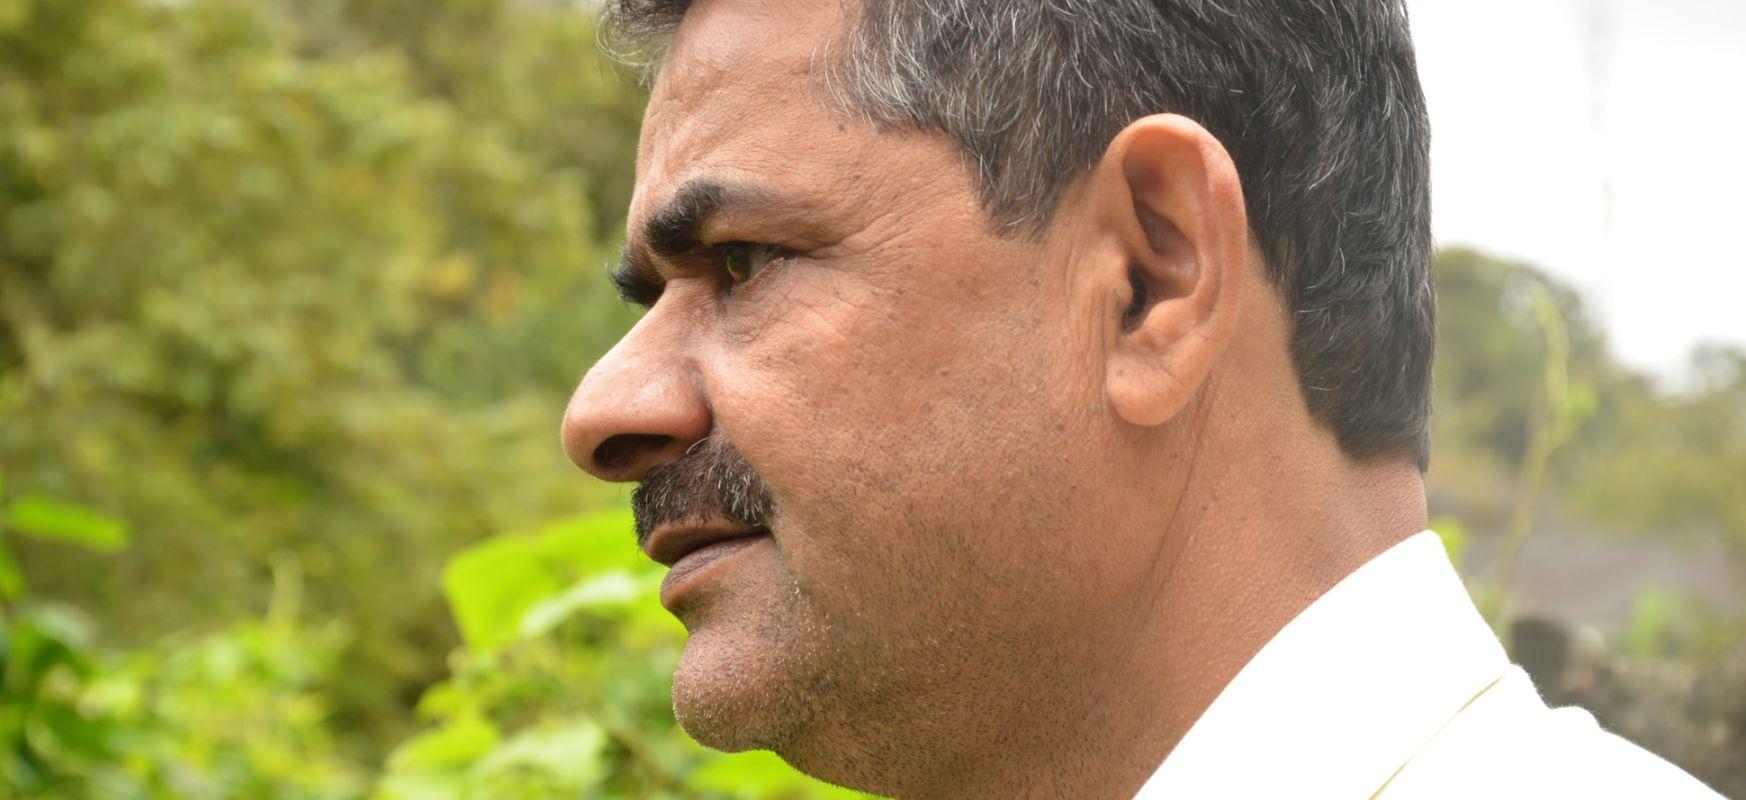 In Conversation With Kalkuli Vittal Hegde, The Last of Sringeri's Farmers